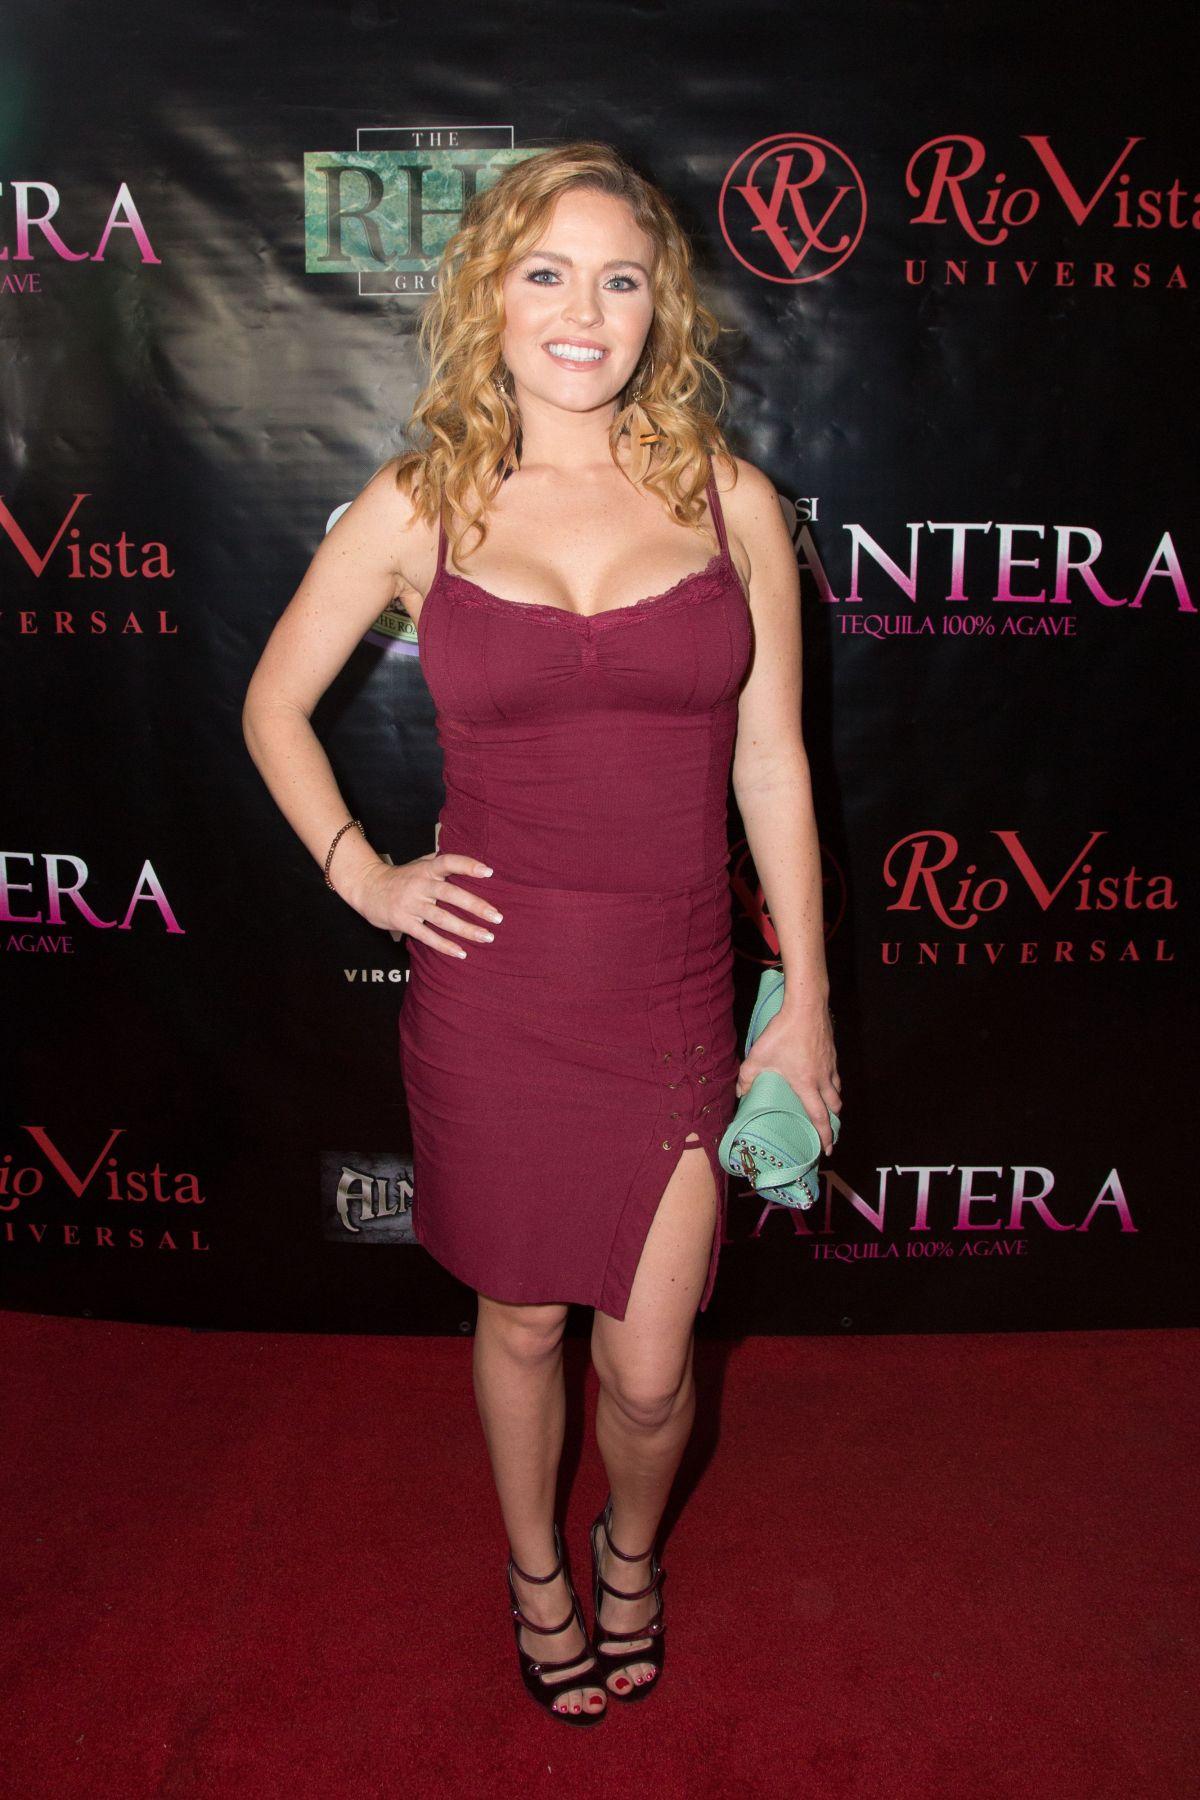 Krissy Lynn celebrities pics 1